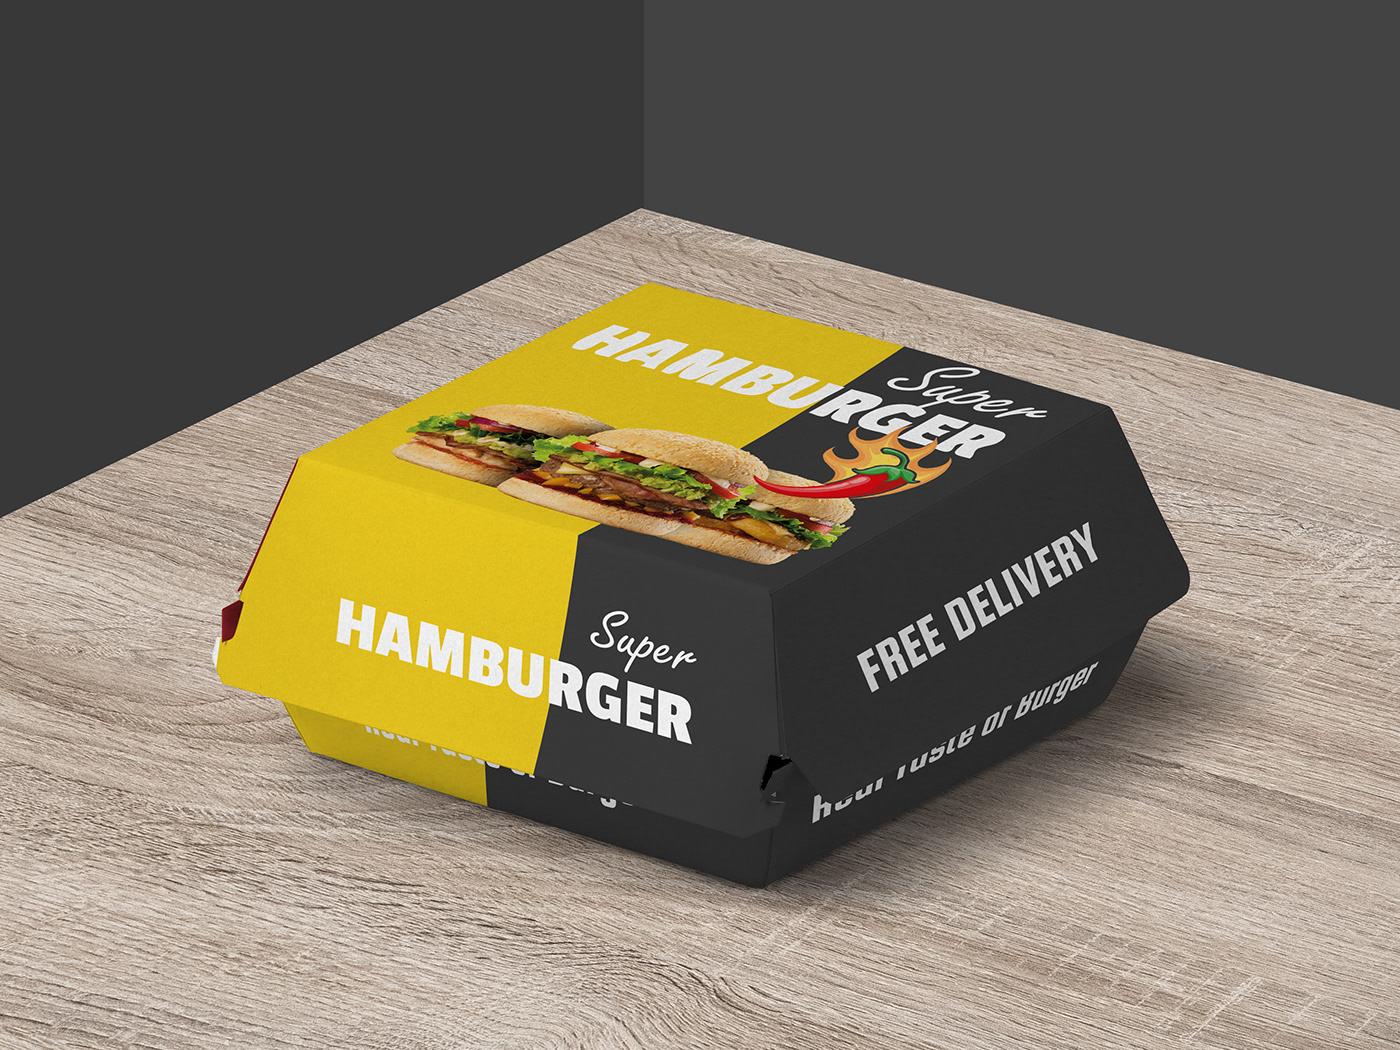 Image may contain: fast food, food and box